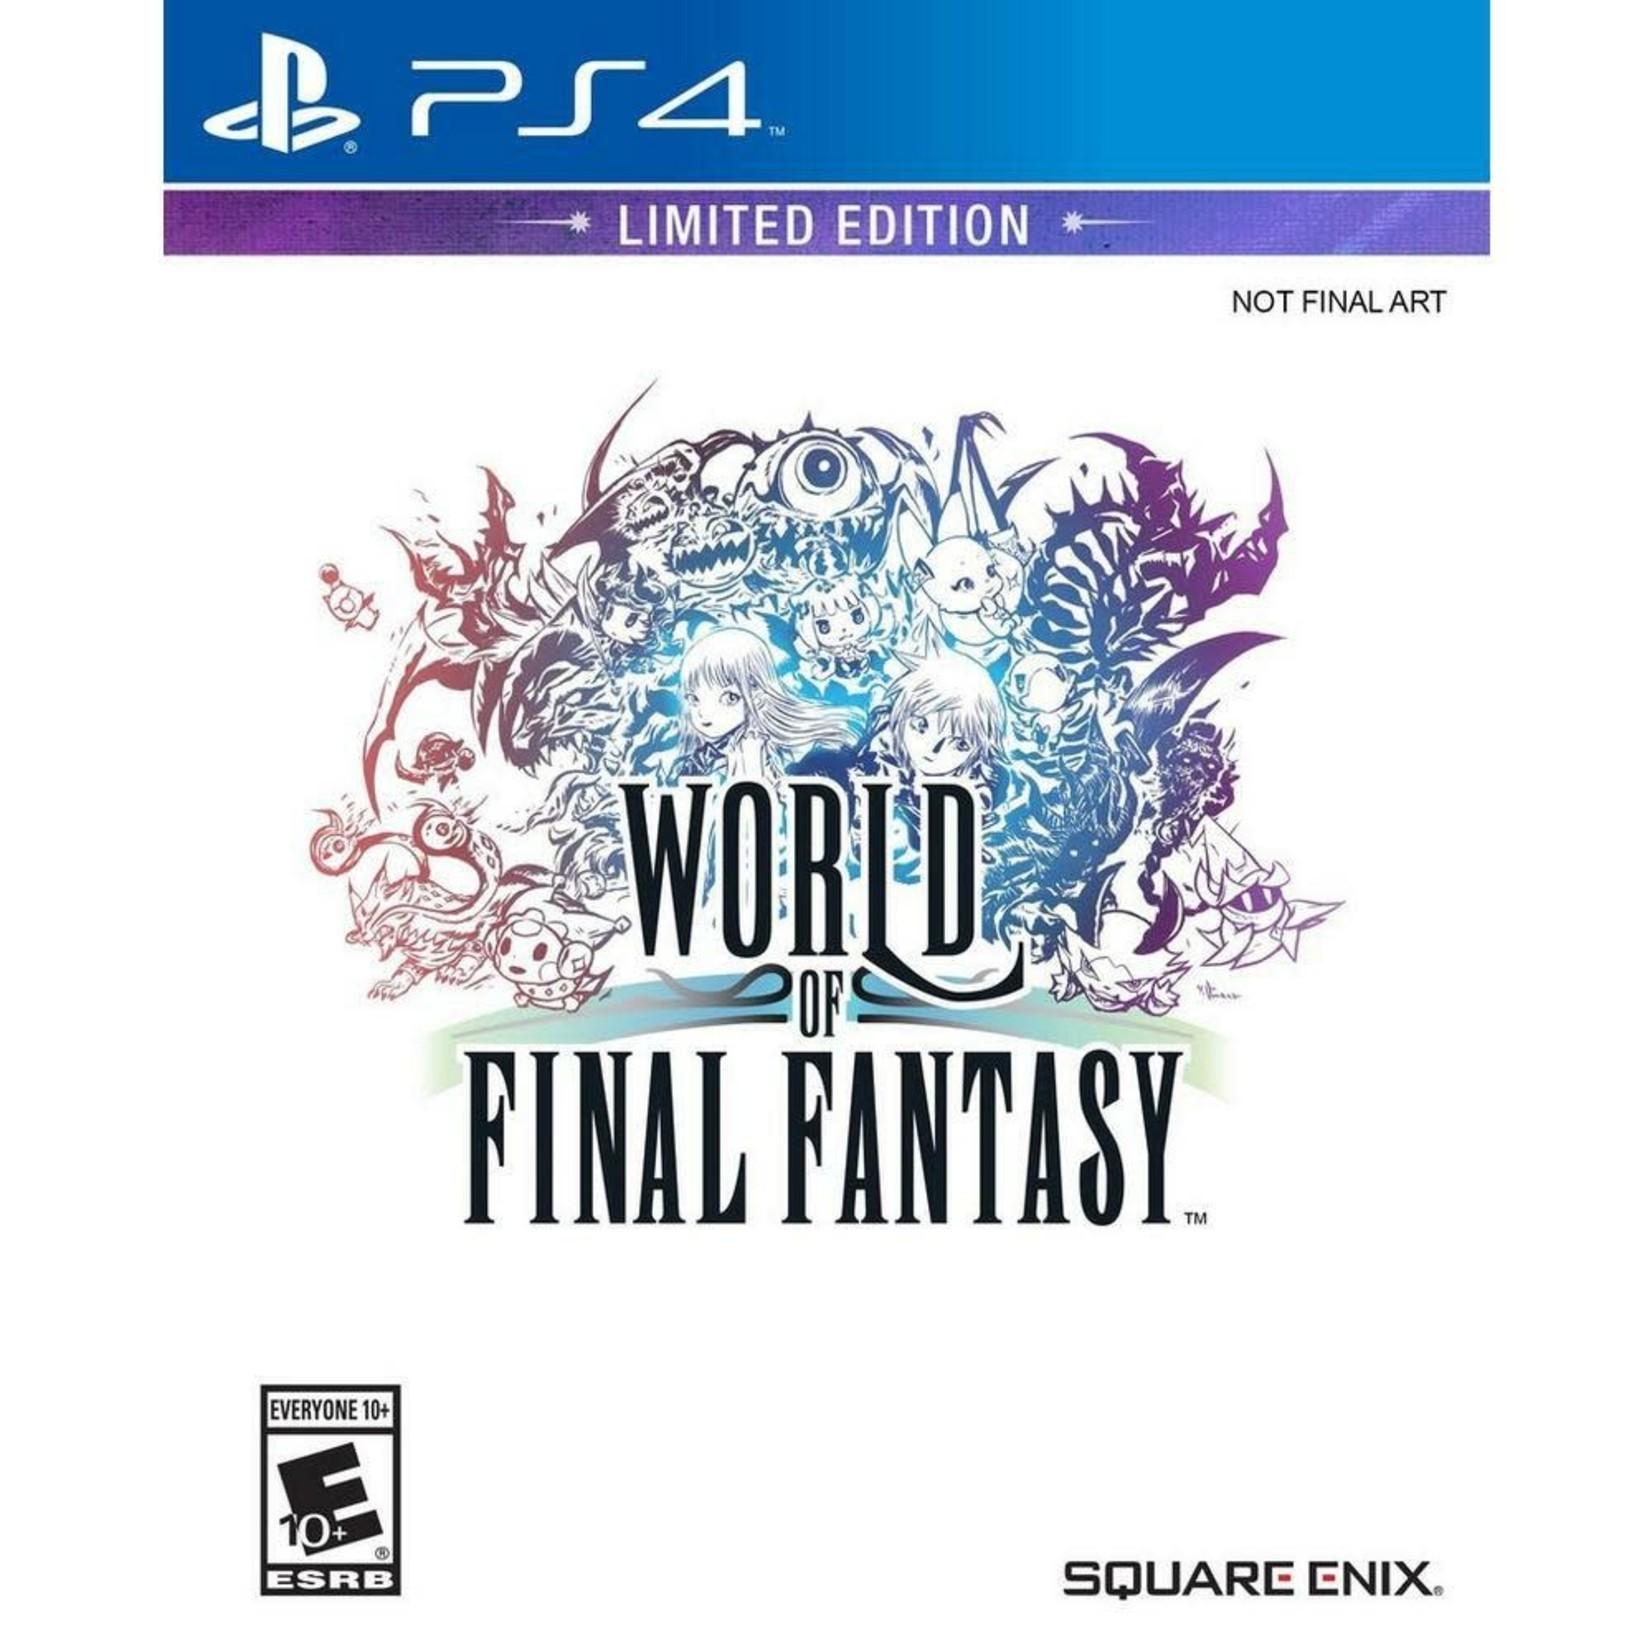 PS4-World of Final Fantasy